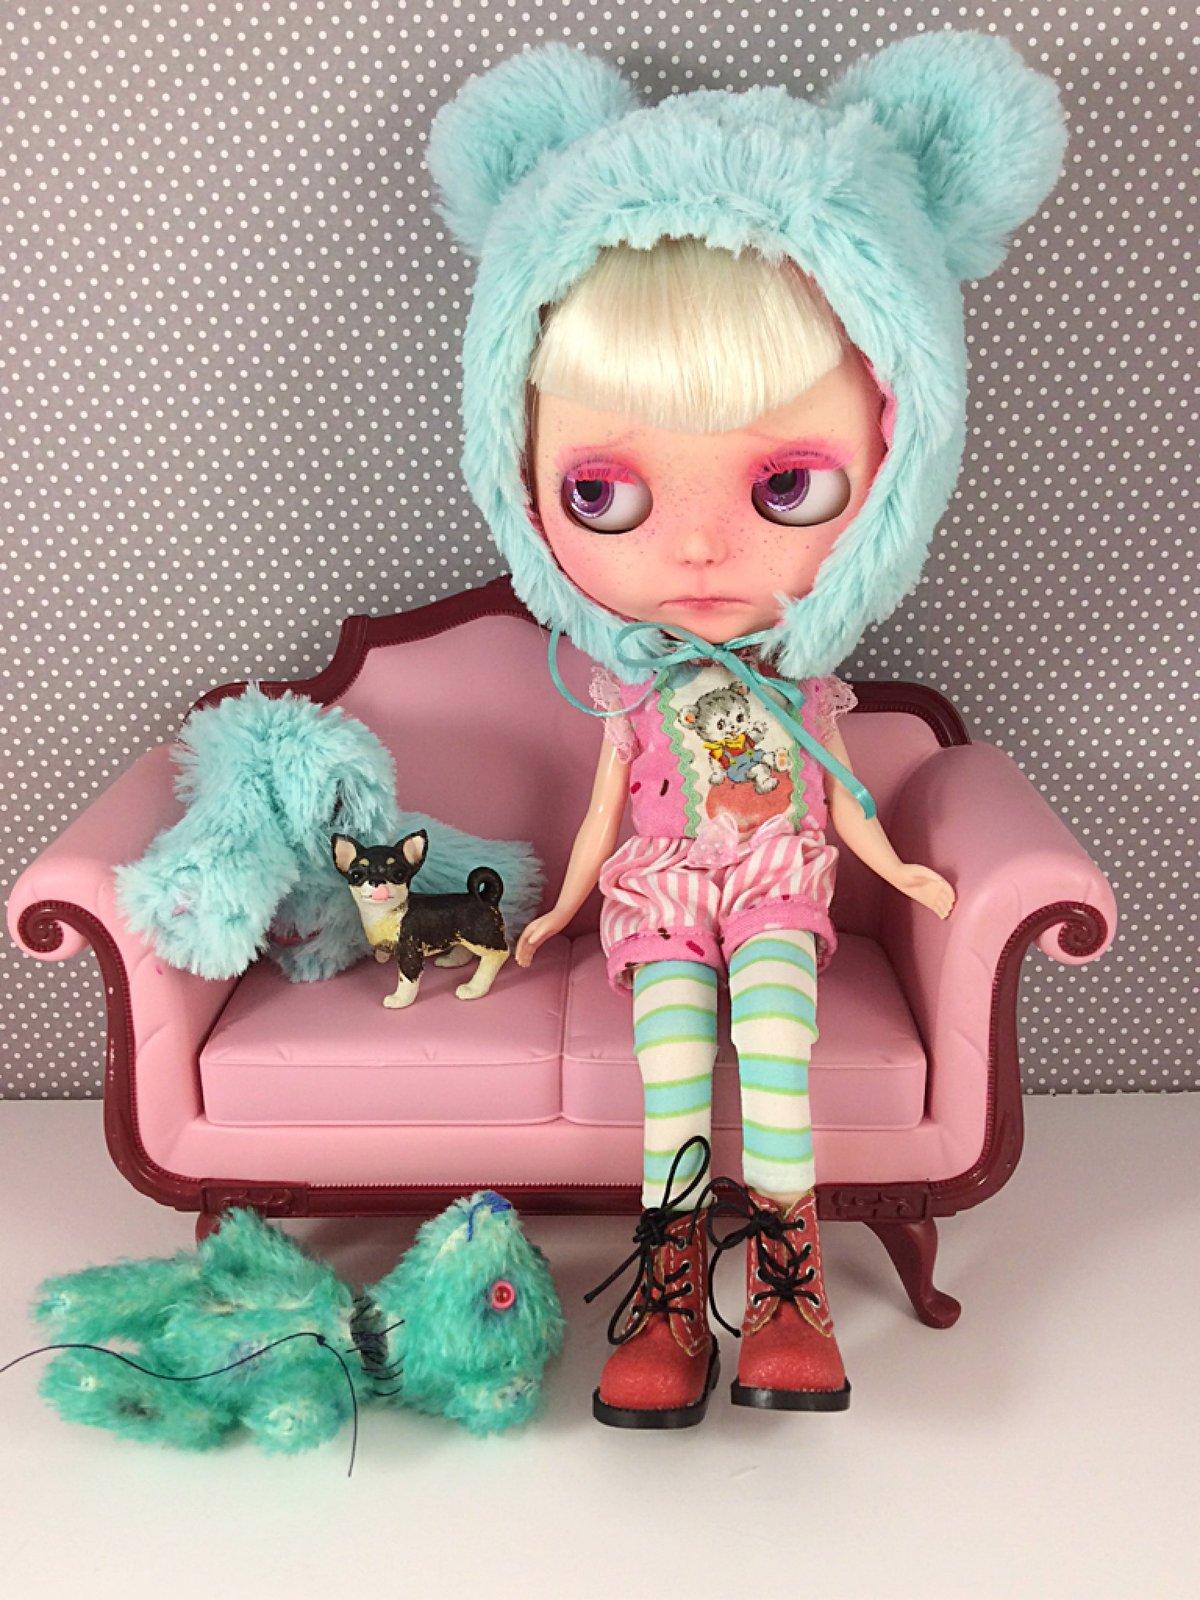 OOAK Custom Blythe by Becky Gould : A Date w/ Blythe Auction